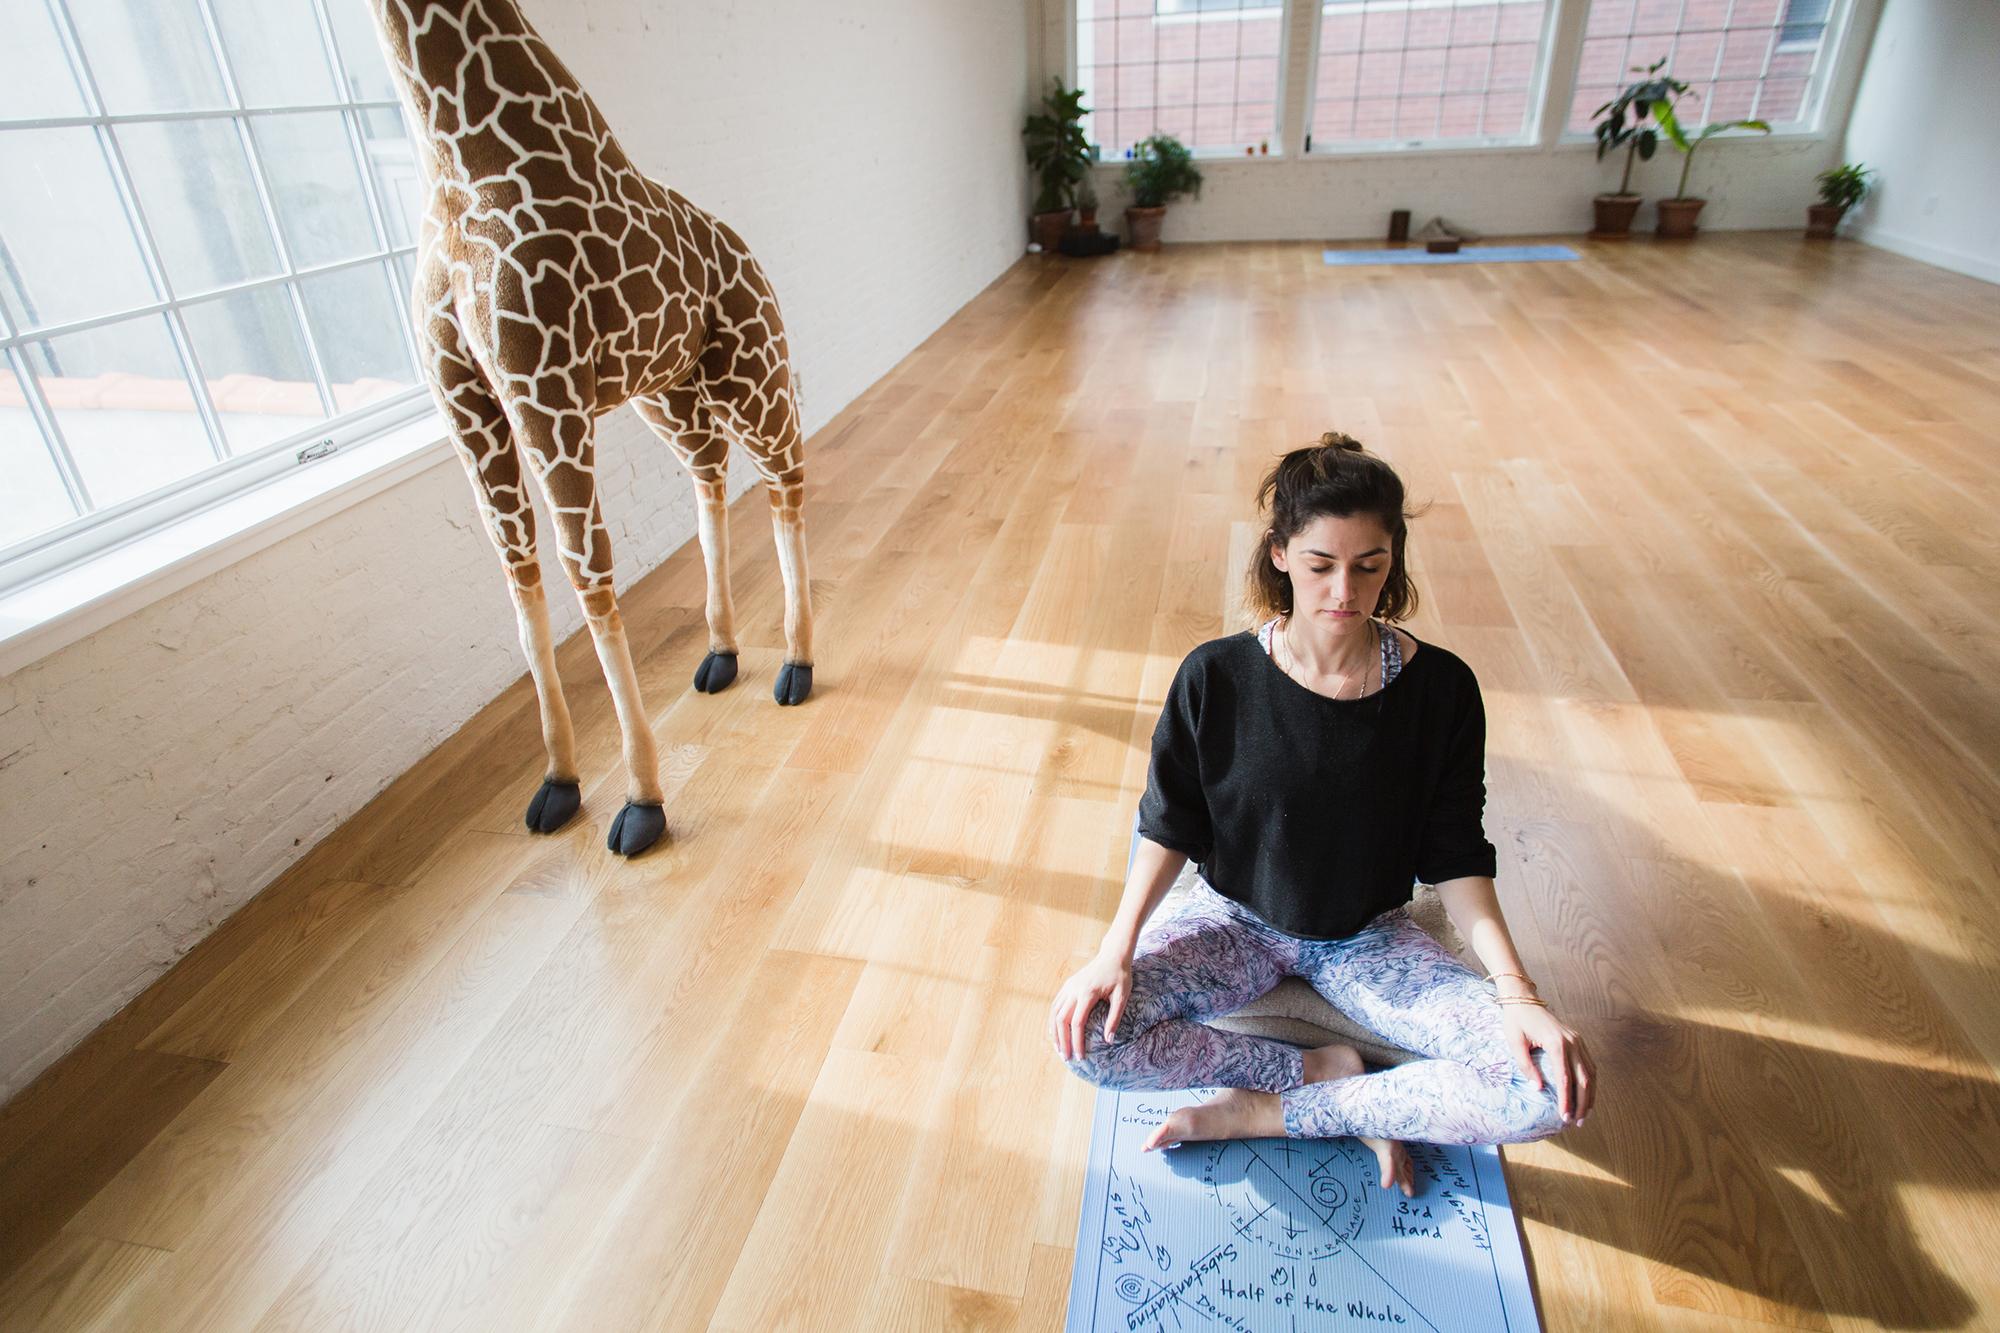 Briana Feigon at Sky Ting Yoga